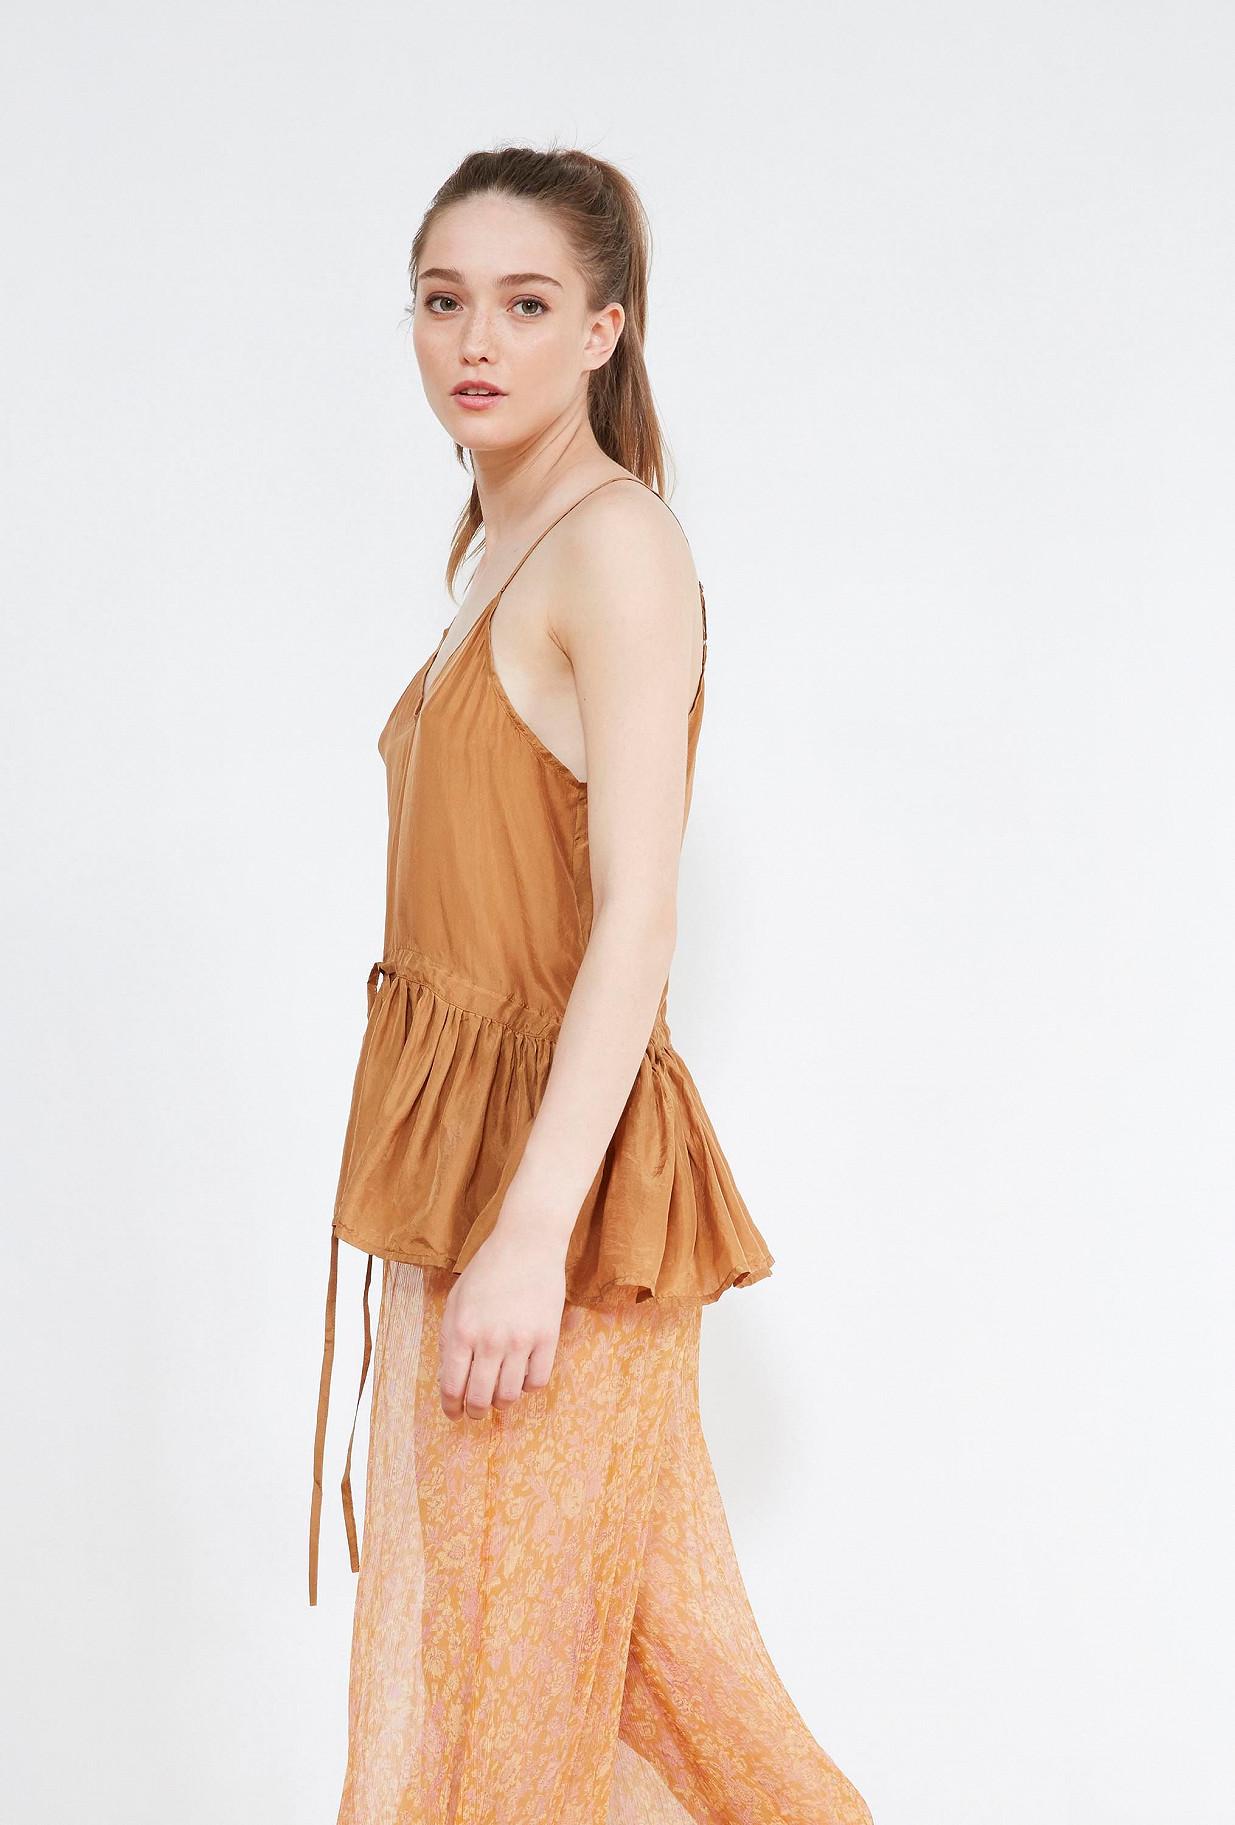 clothes store TOP  Elvira french designer fashion Paris